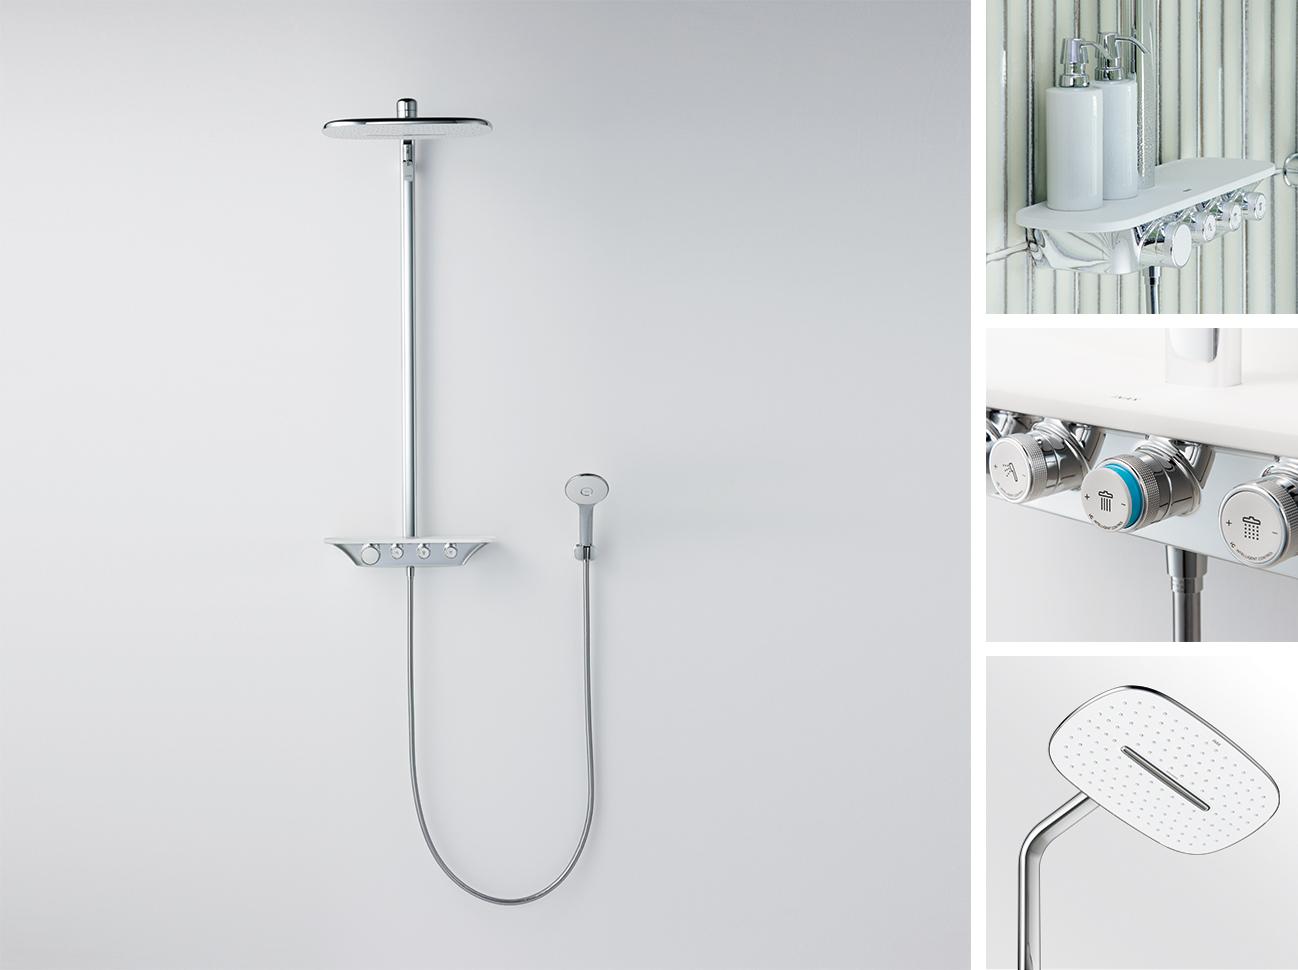 S600-line_shower-system.jpg